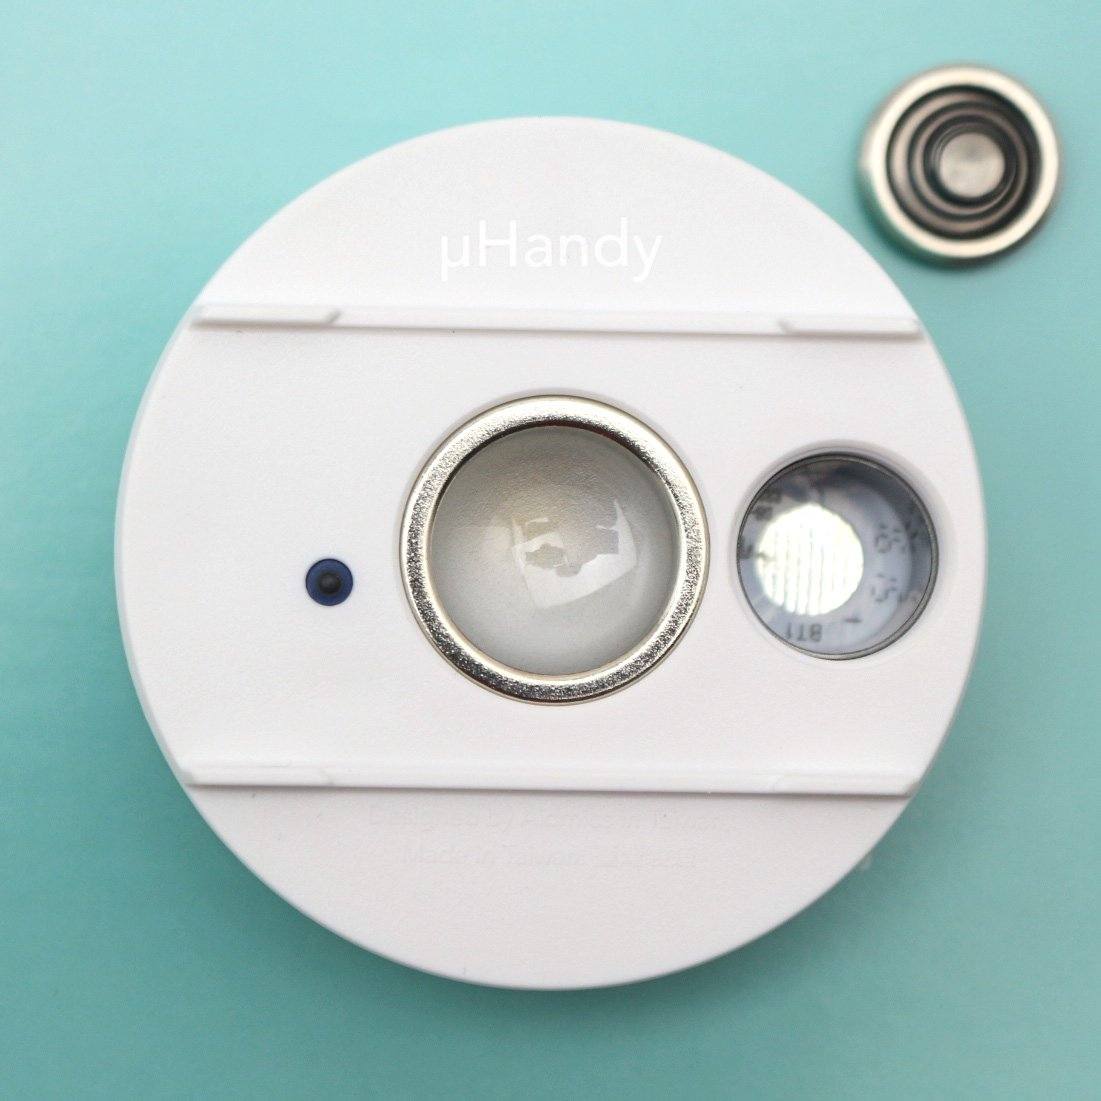 Aidmics Biotechnology スマホ顕微鏡 μHandy Basic & 高倍率レンズクリップセット【画像40】